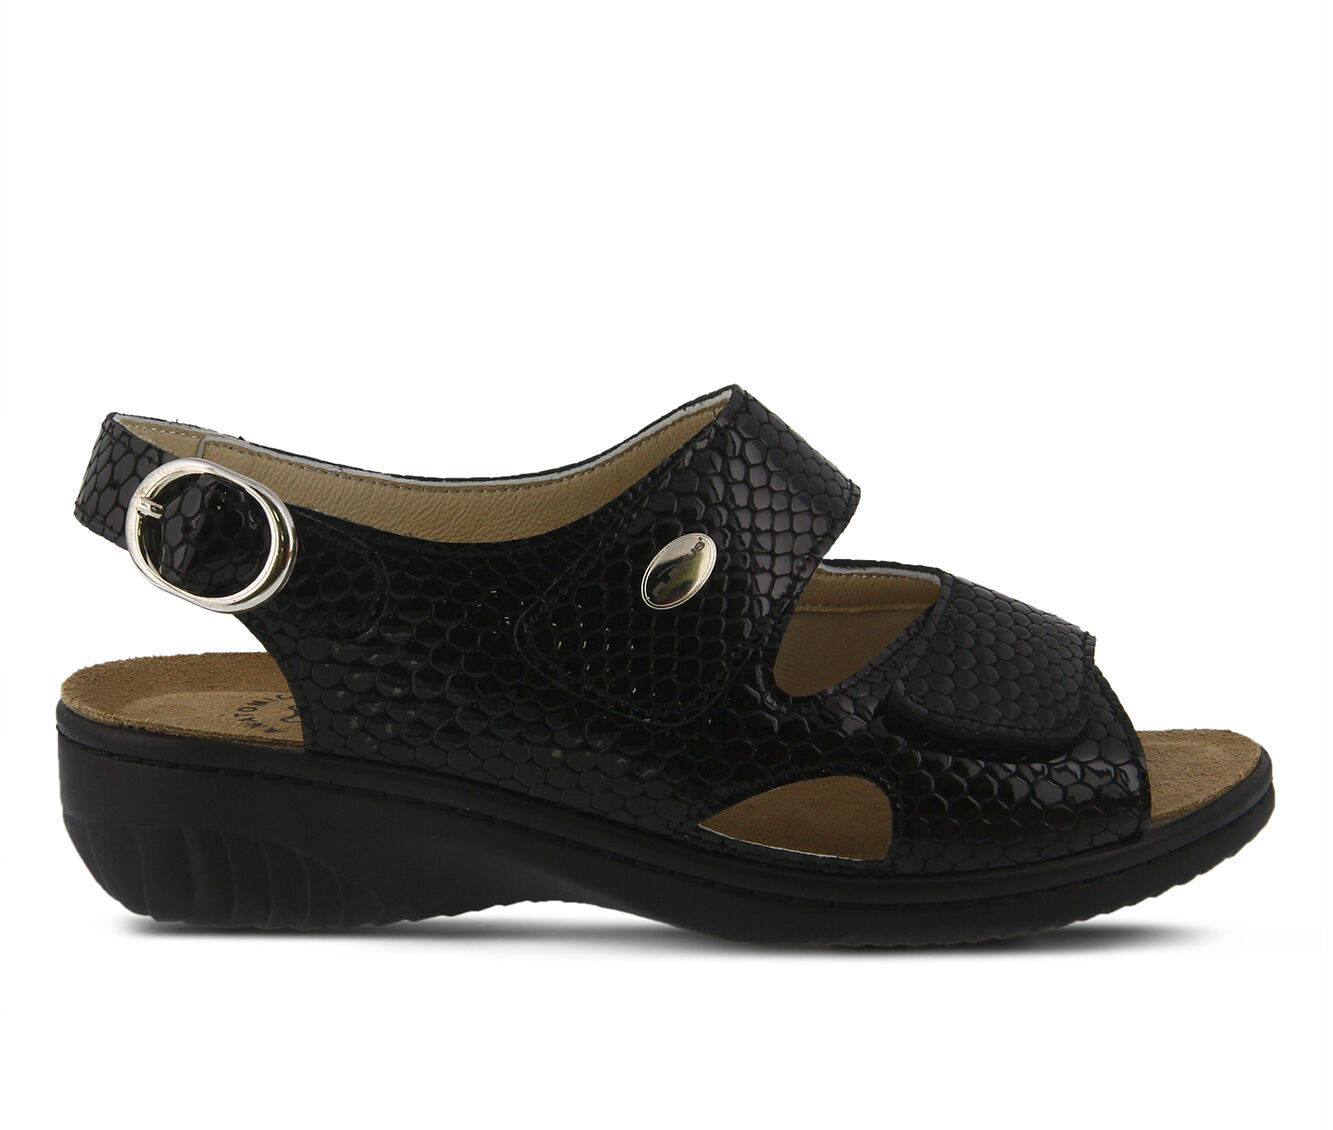 Women's FLEXUS Aksamala Sandals Black Pat